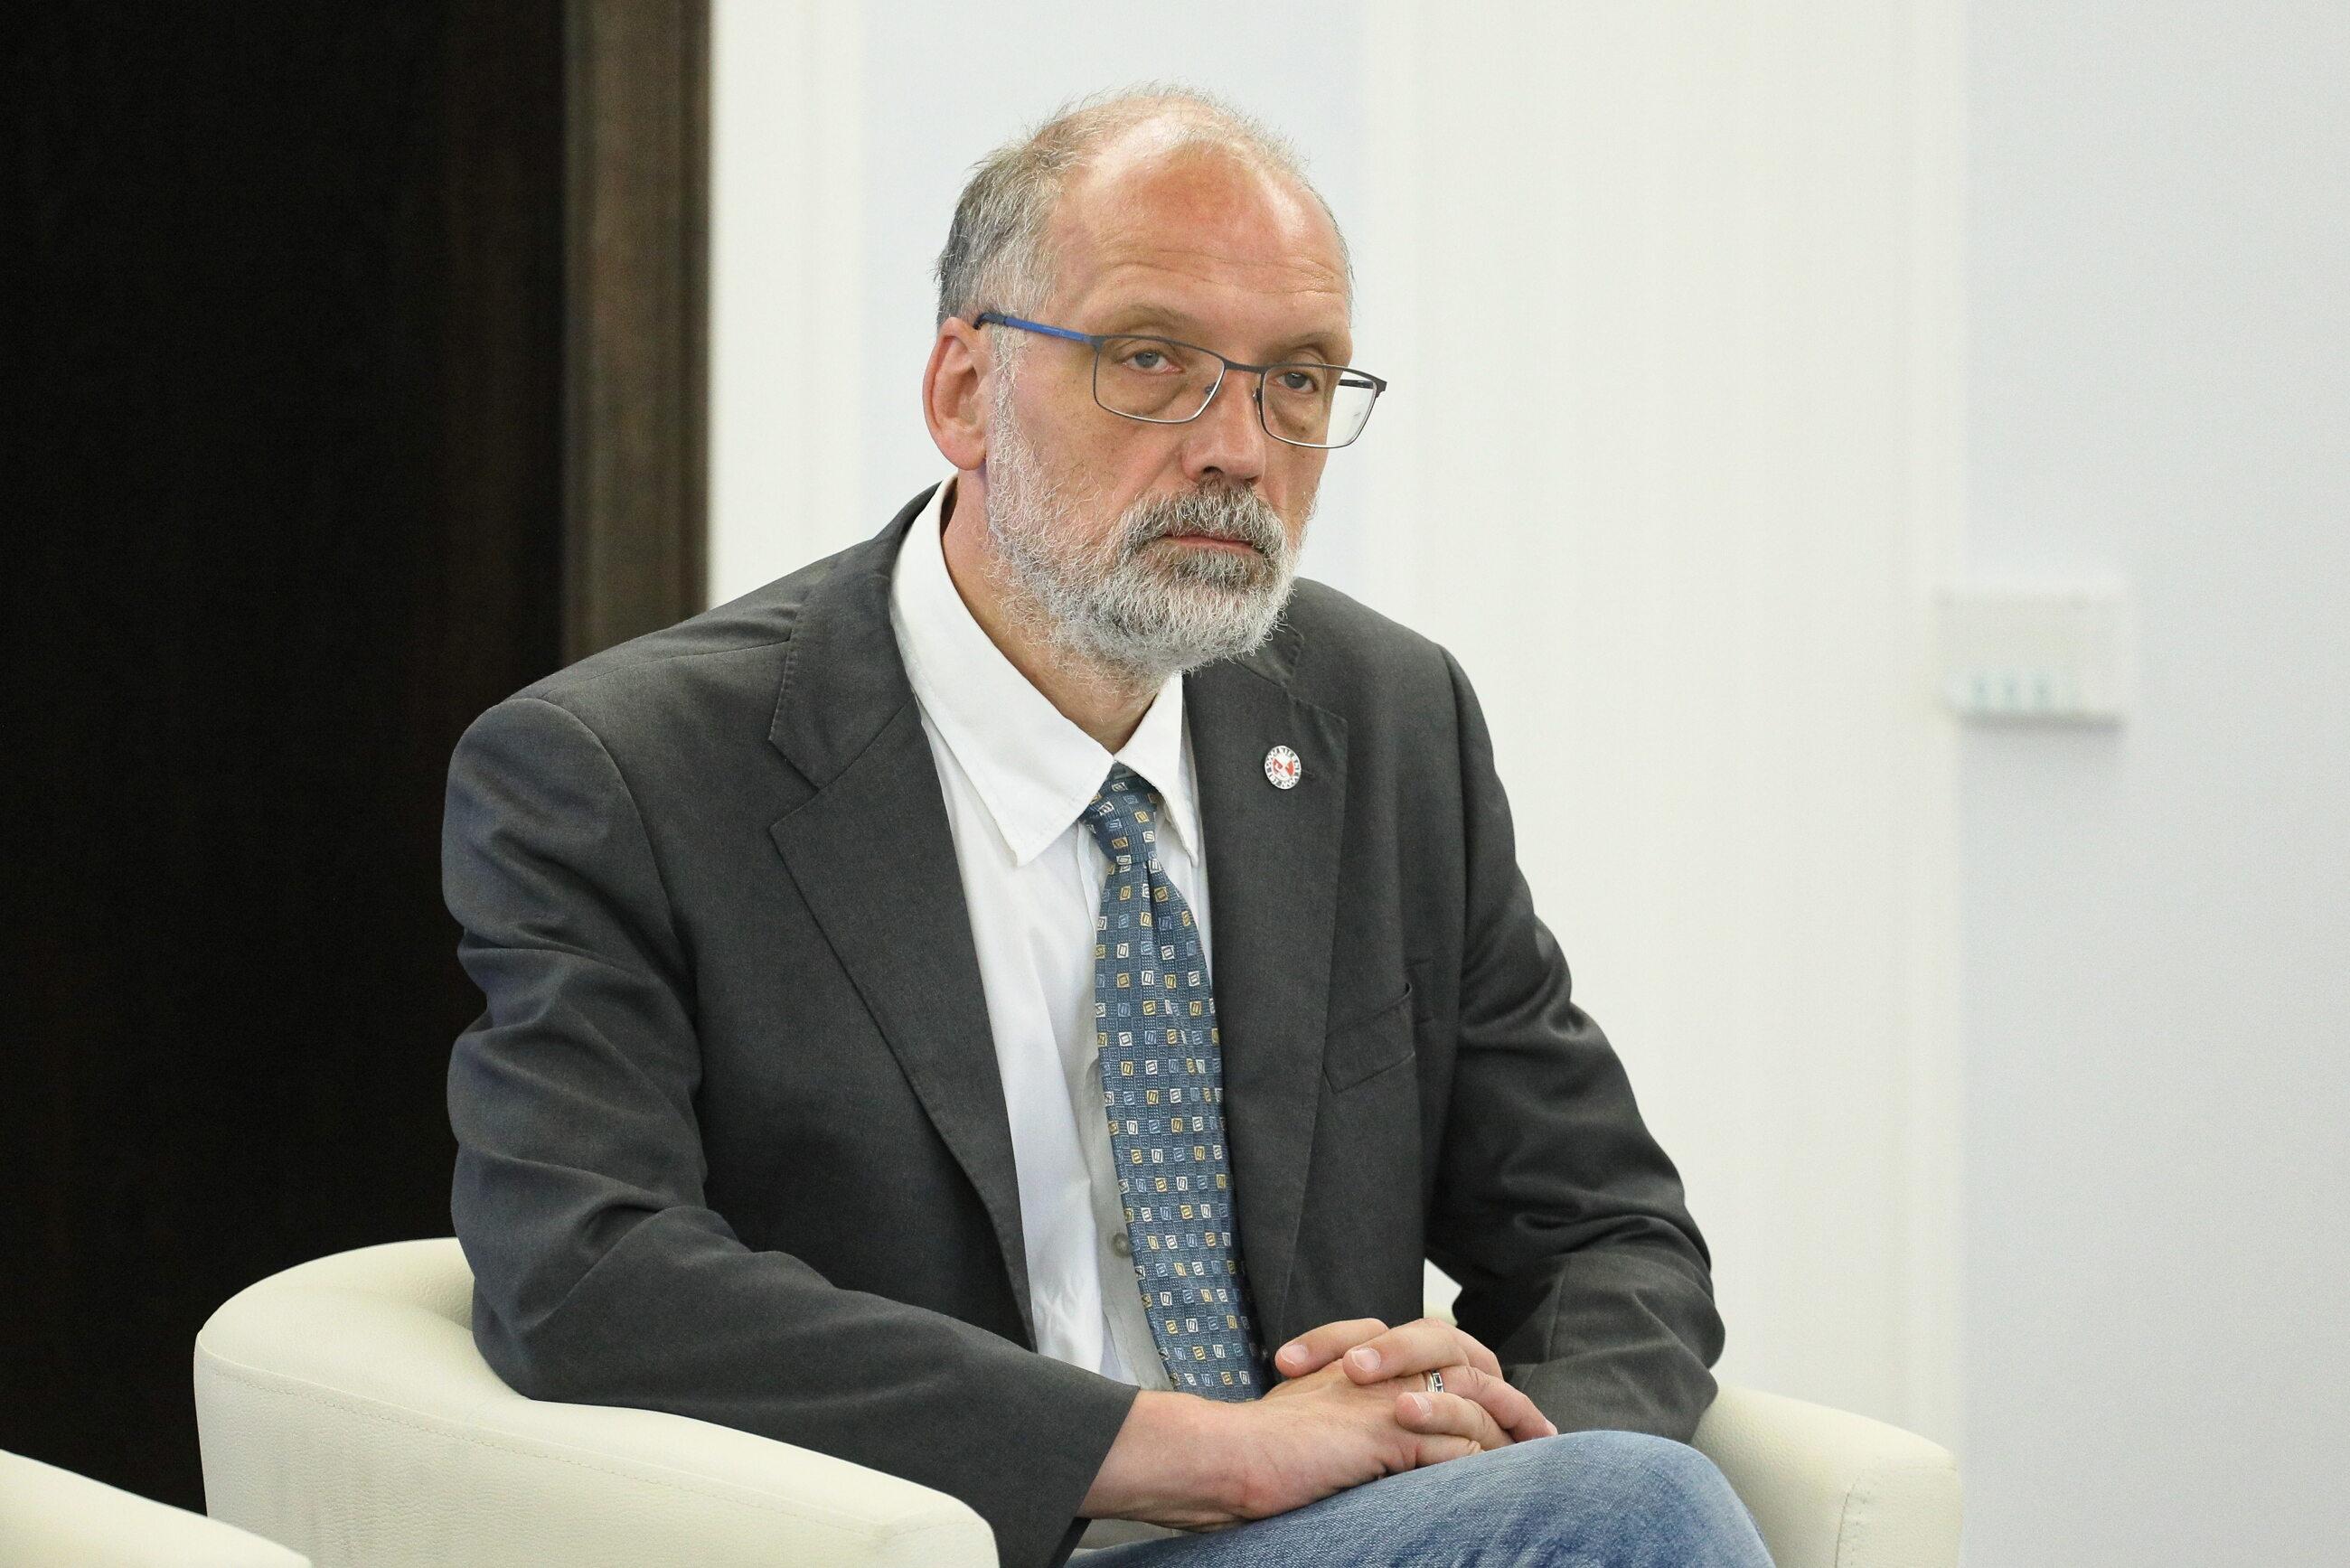 Historyk, prof. Andrzej Nowak